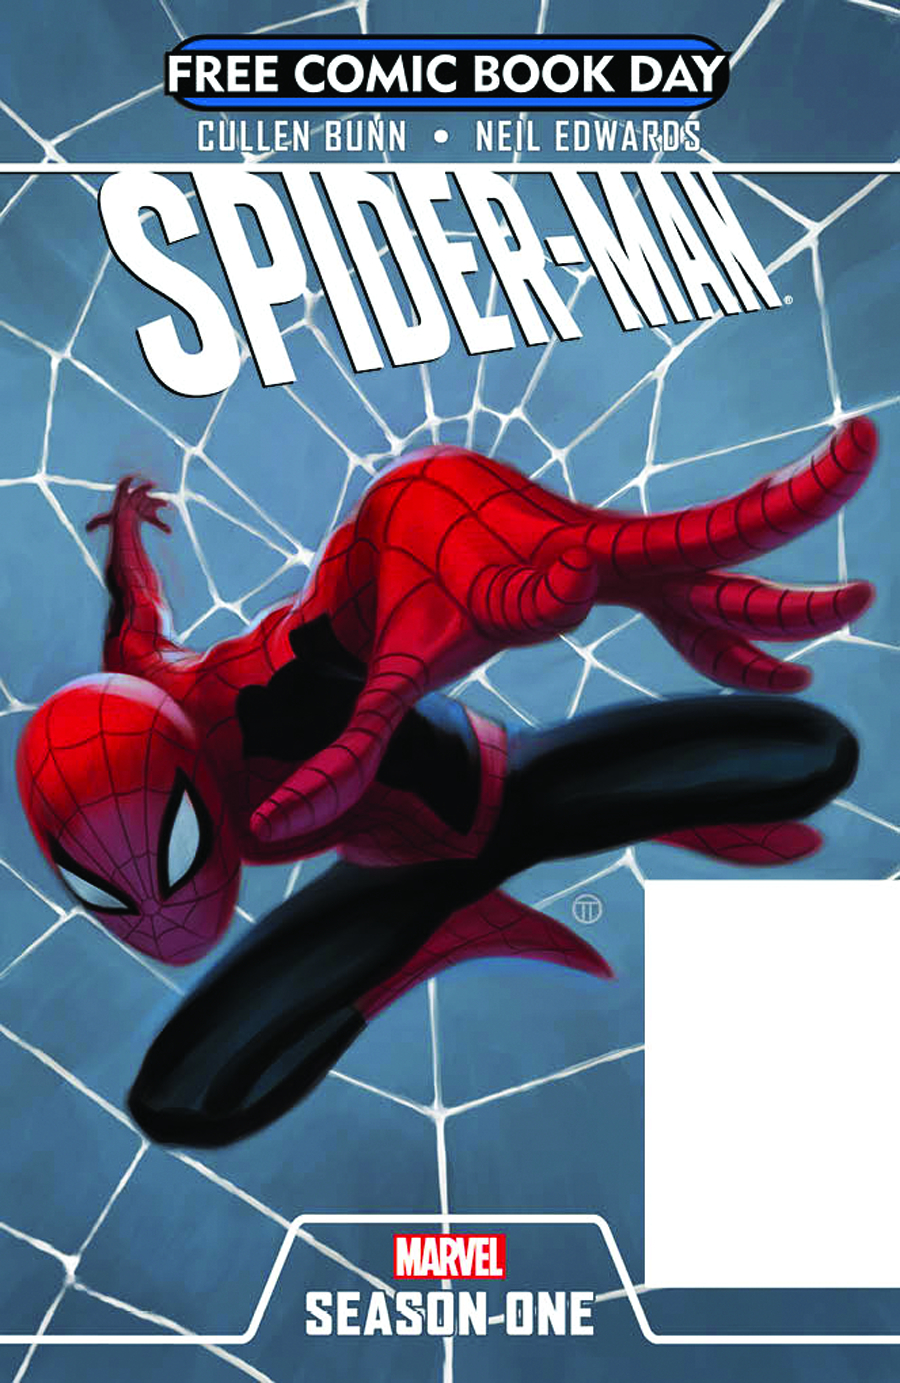 STK460558 Free Comic Book Day 2012: Reviews!